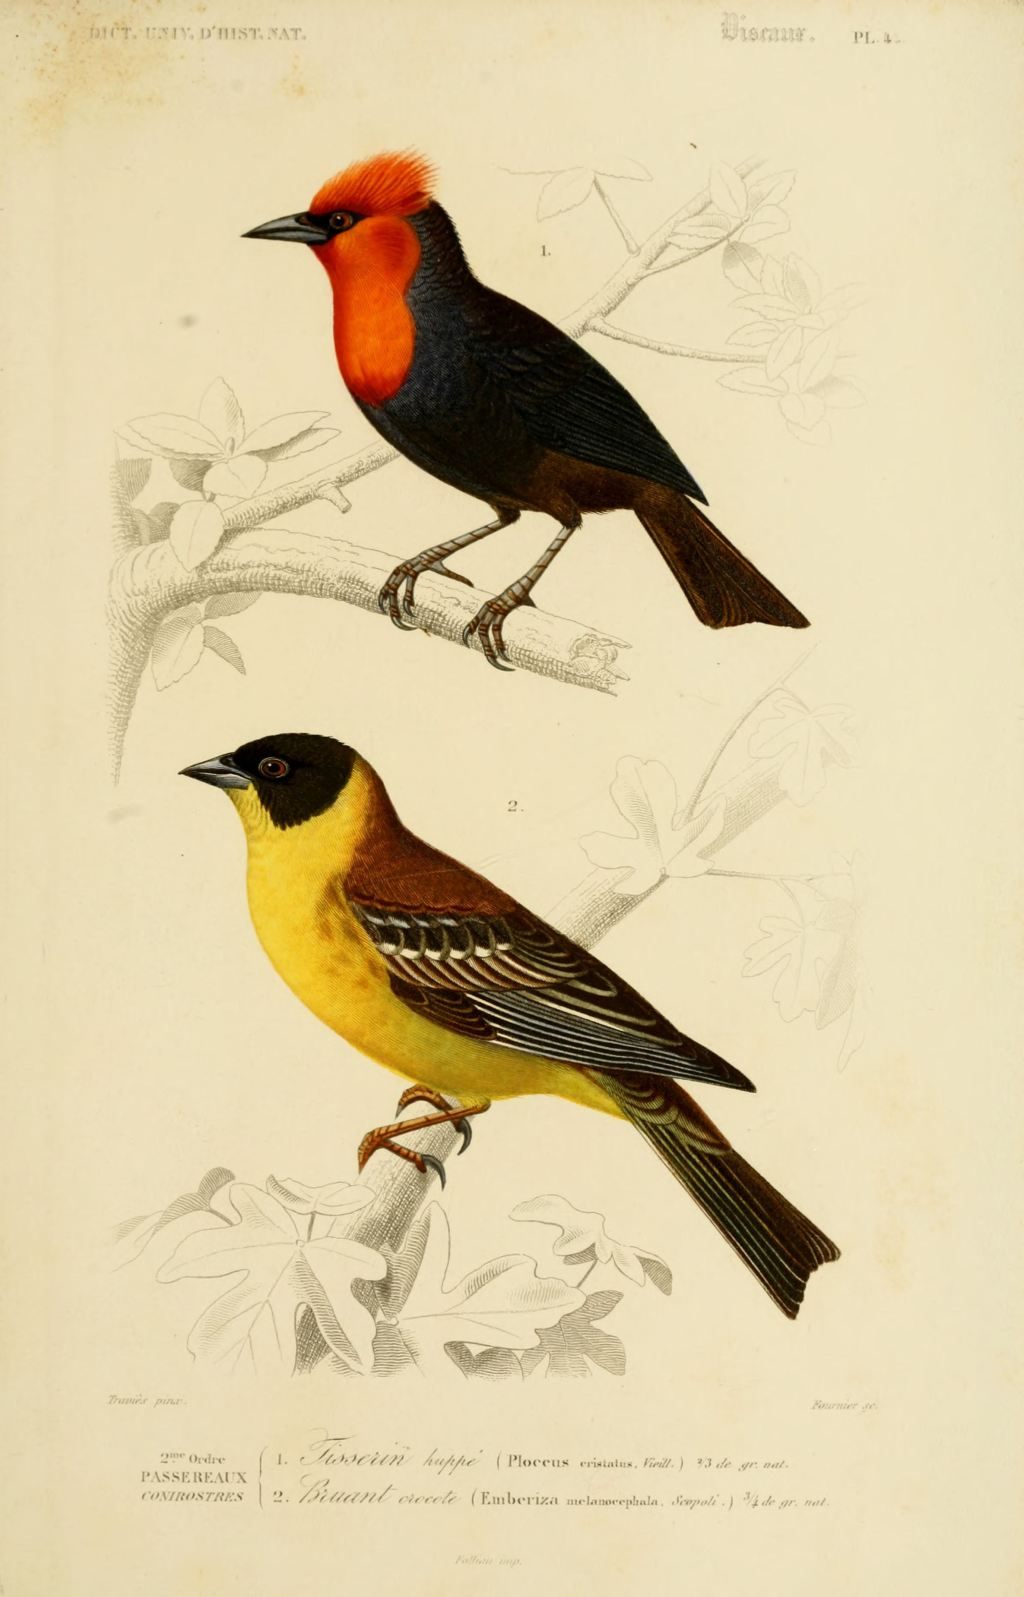 gravures couleur d 39 oiseaux gravure oiseau 0211 brunant crocote emberiza melanocephala. Black Bedroom Furniture Sets. Home Design Ideas